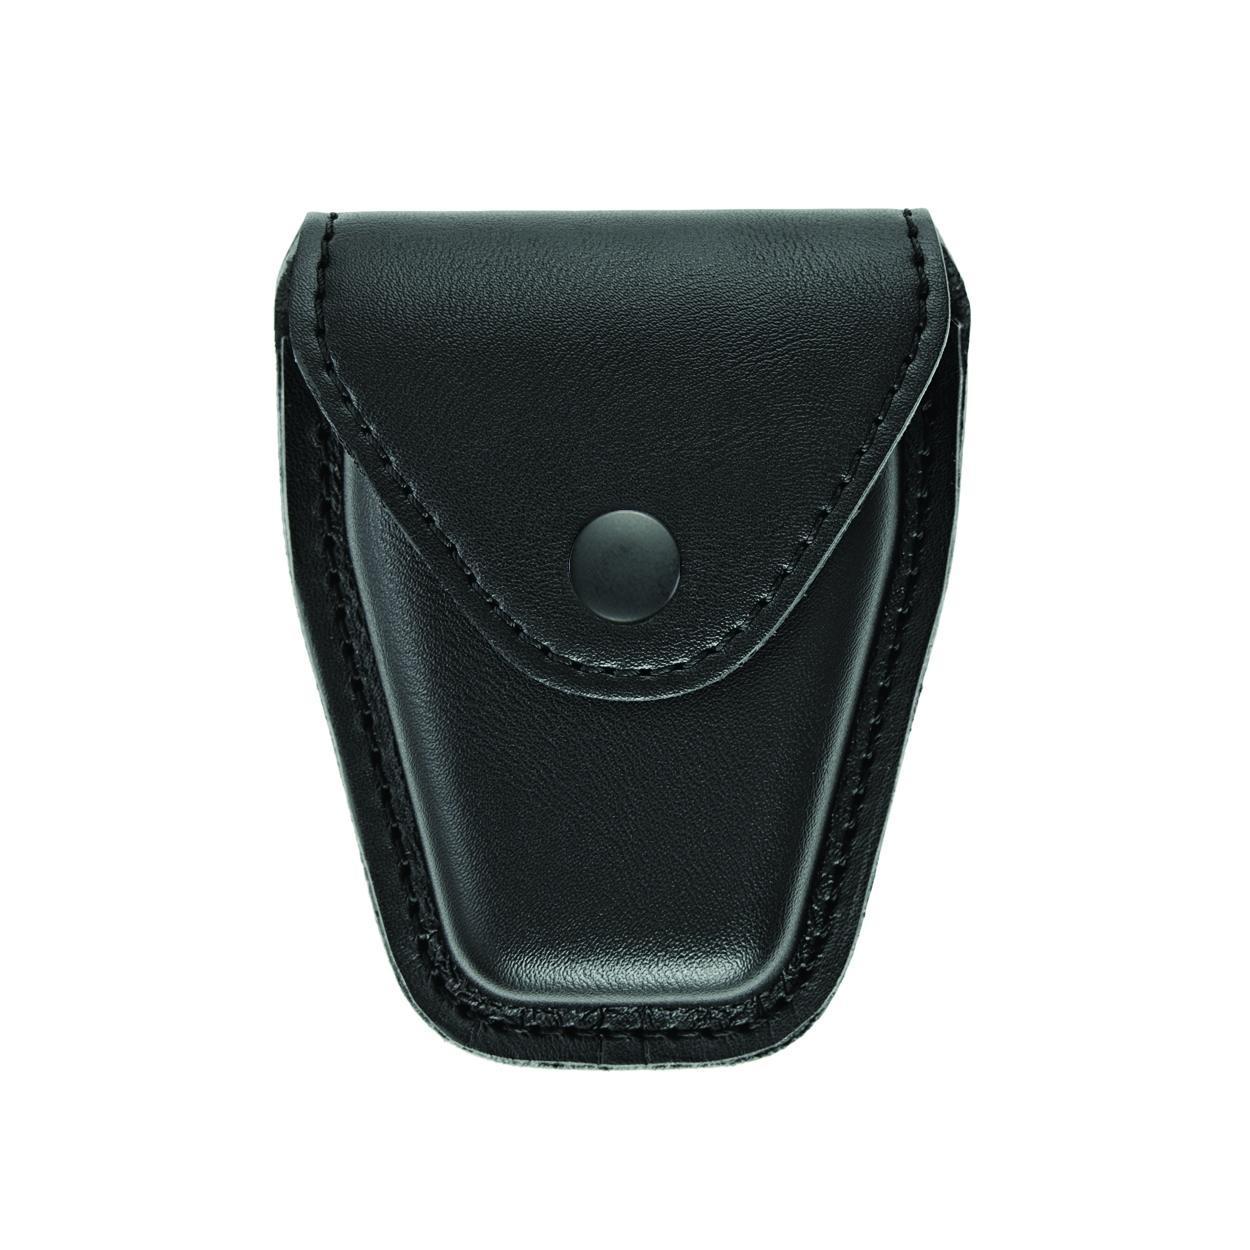 Handcuff Case, Single, Small/Chain, AirTek, Smooth, Black Snap-